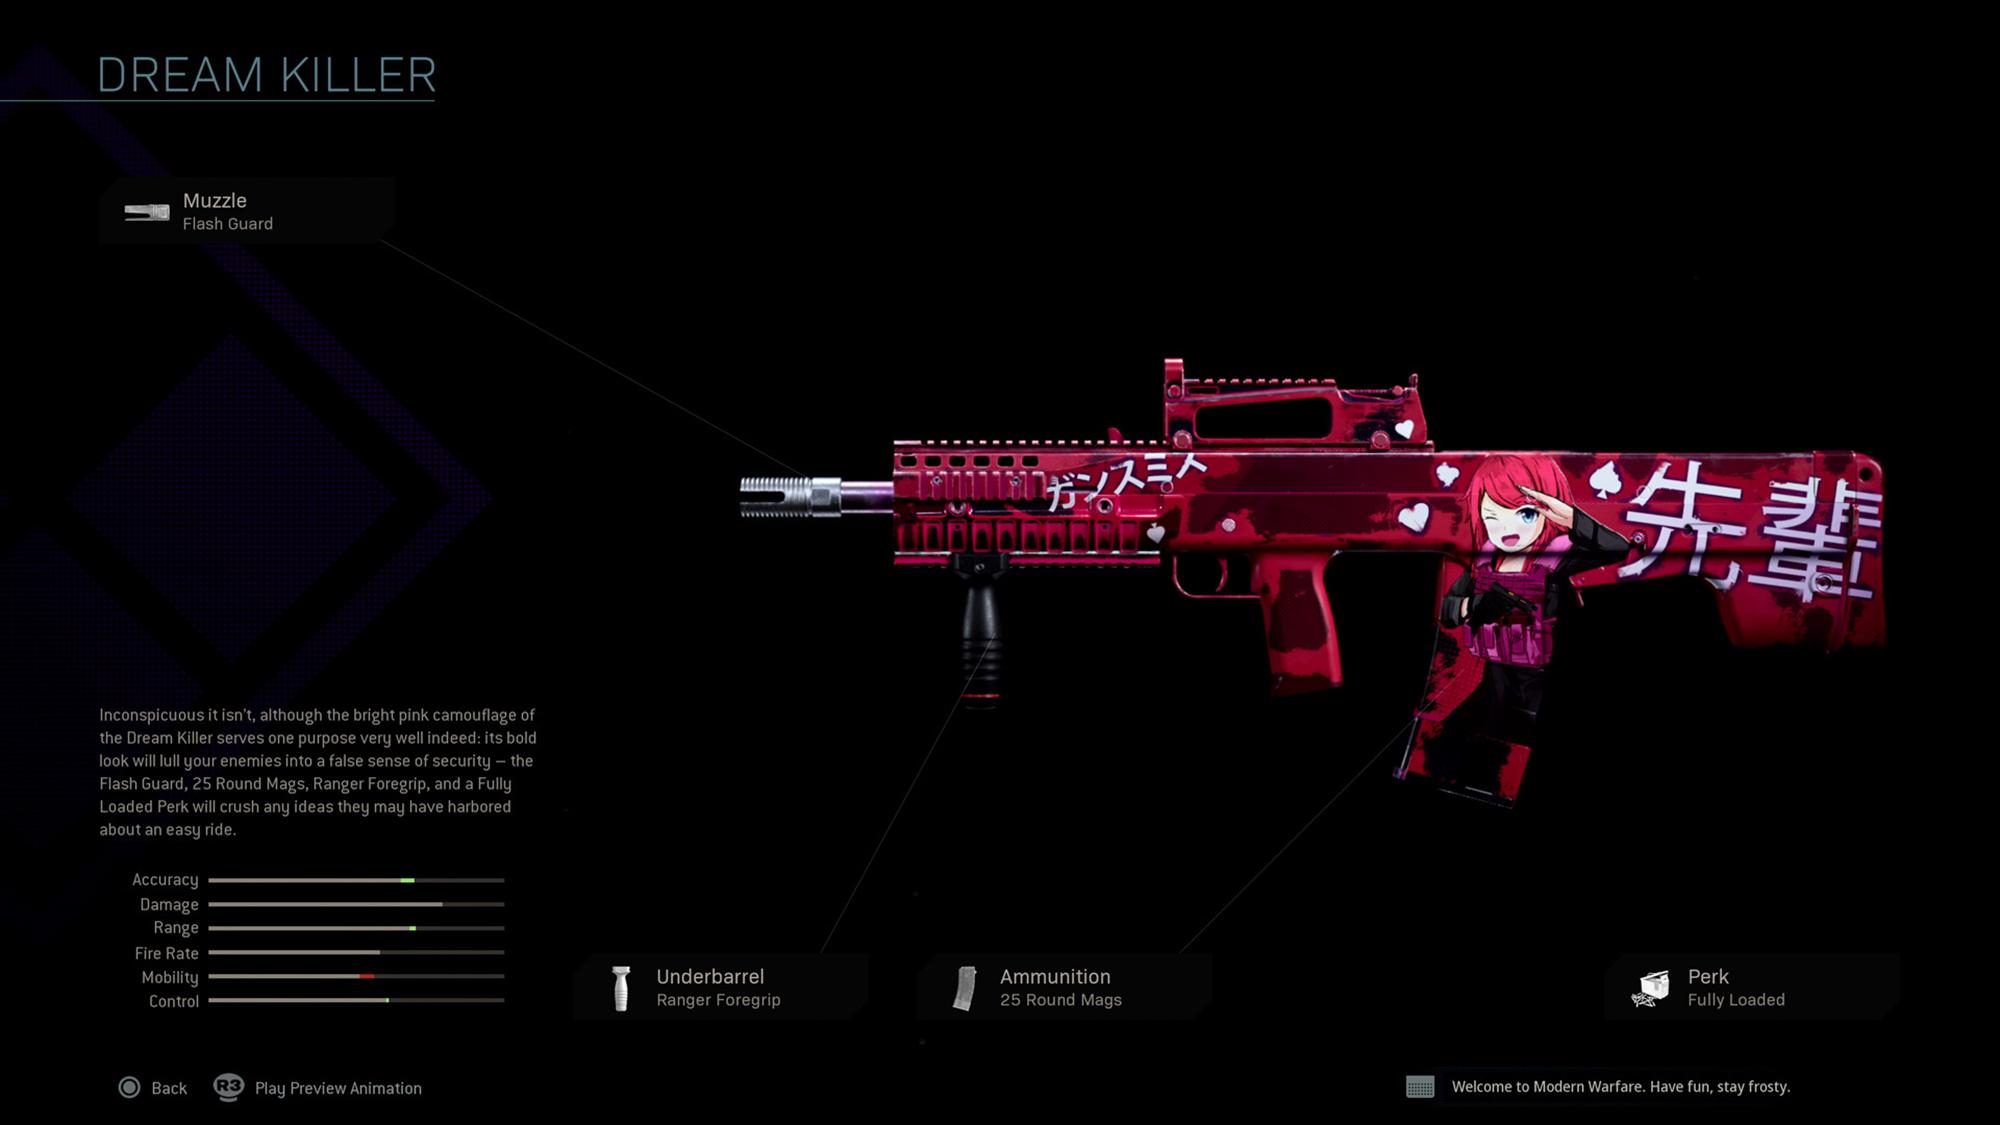 Call Of Duty: Warzone Dream Killer